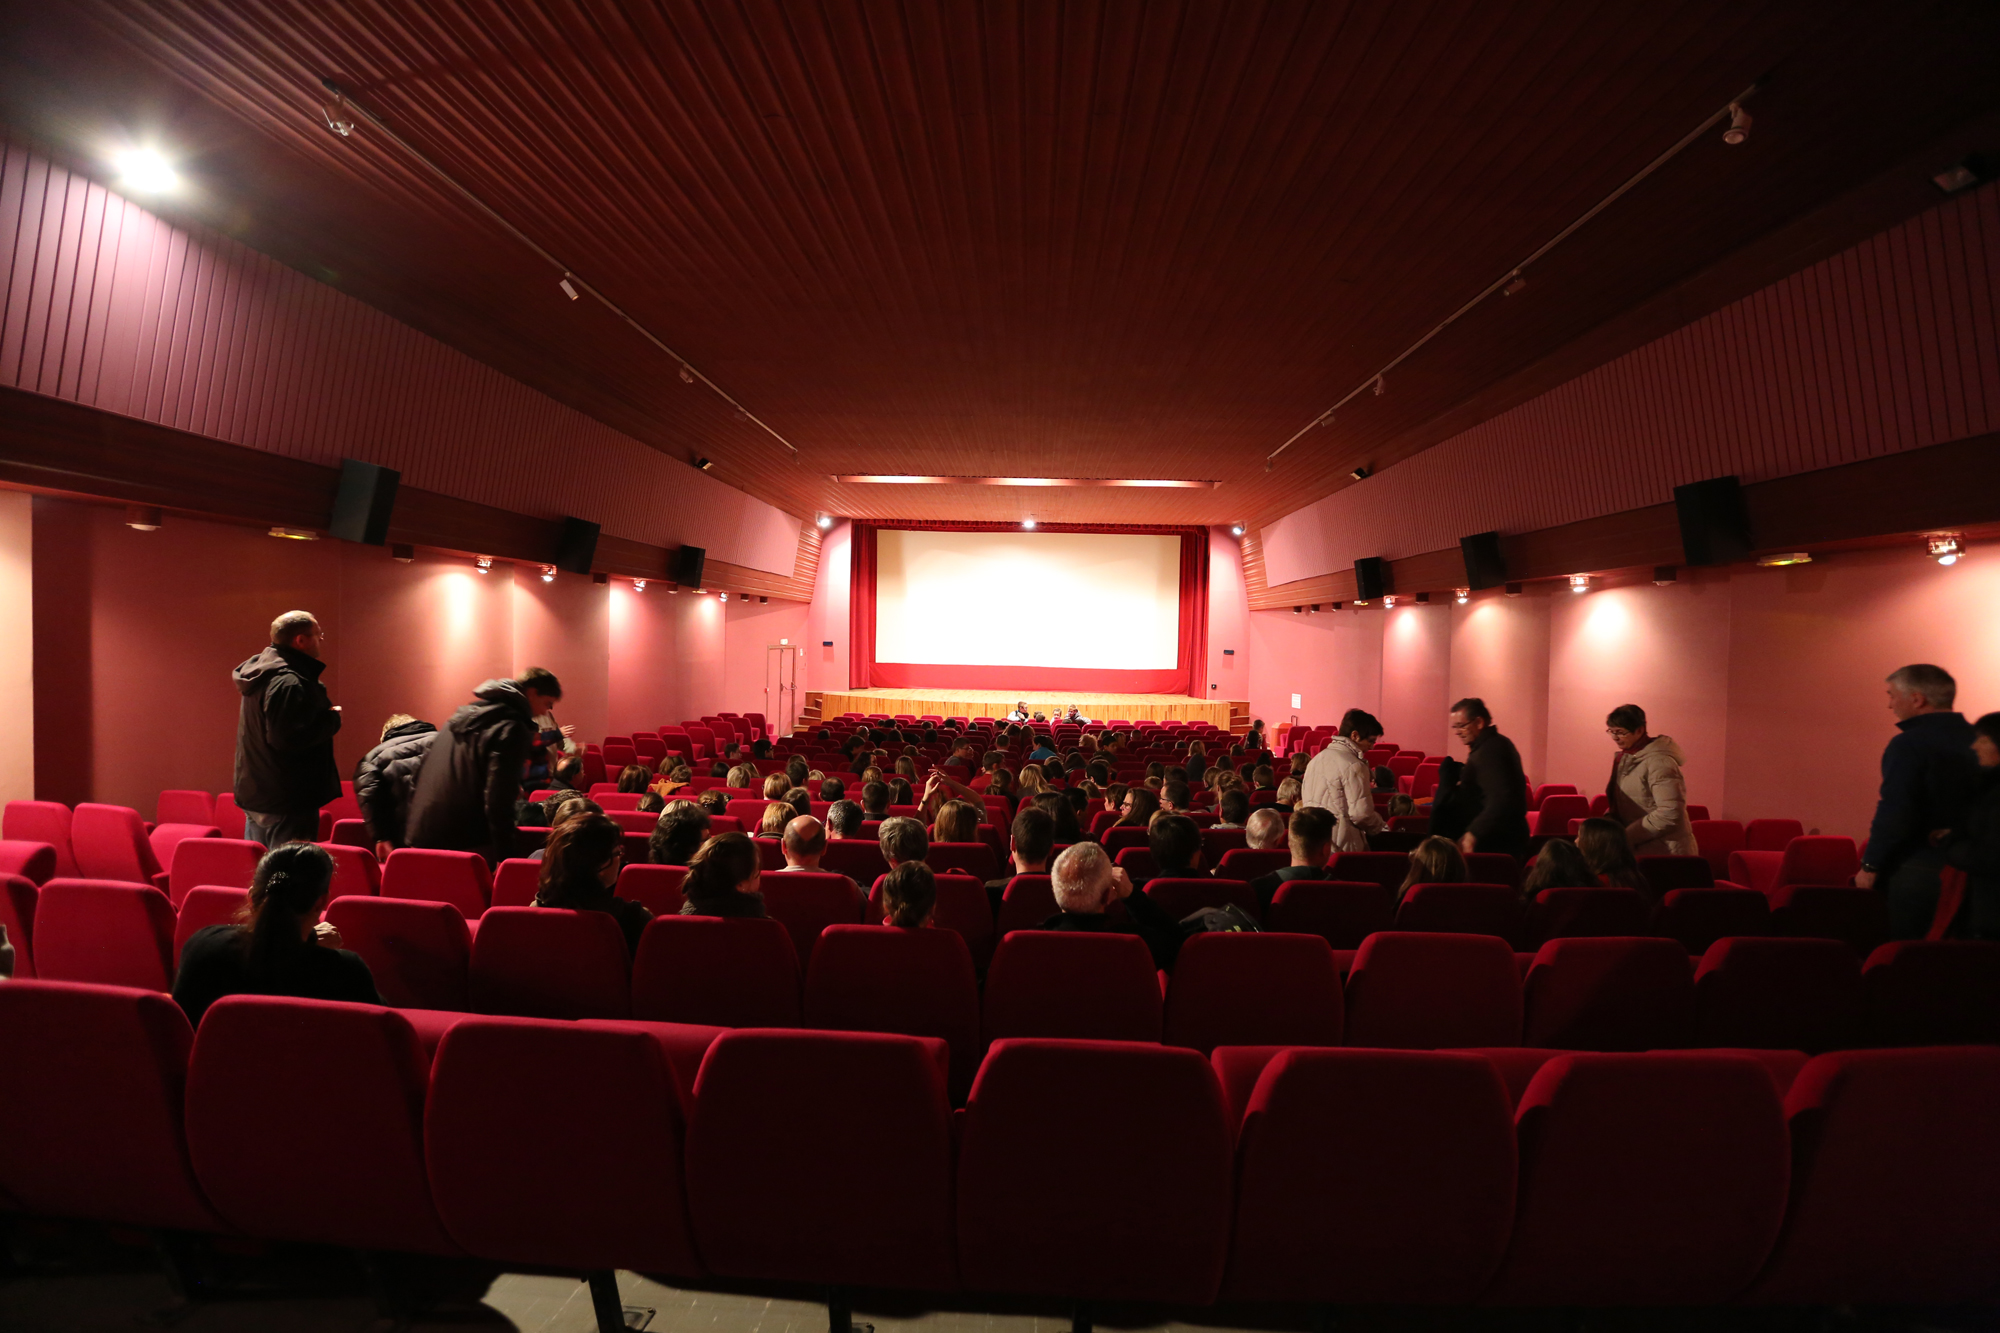 Cinema © P. Delannoy / Ot Valloire